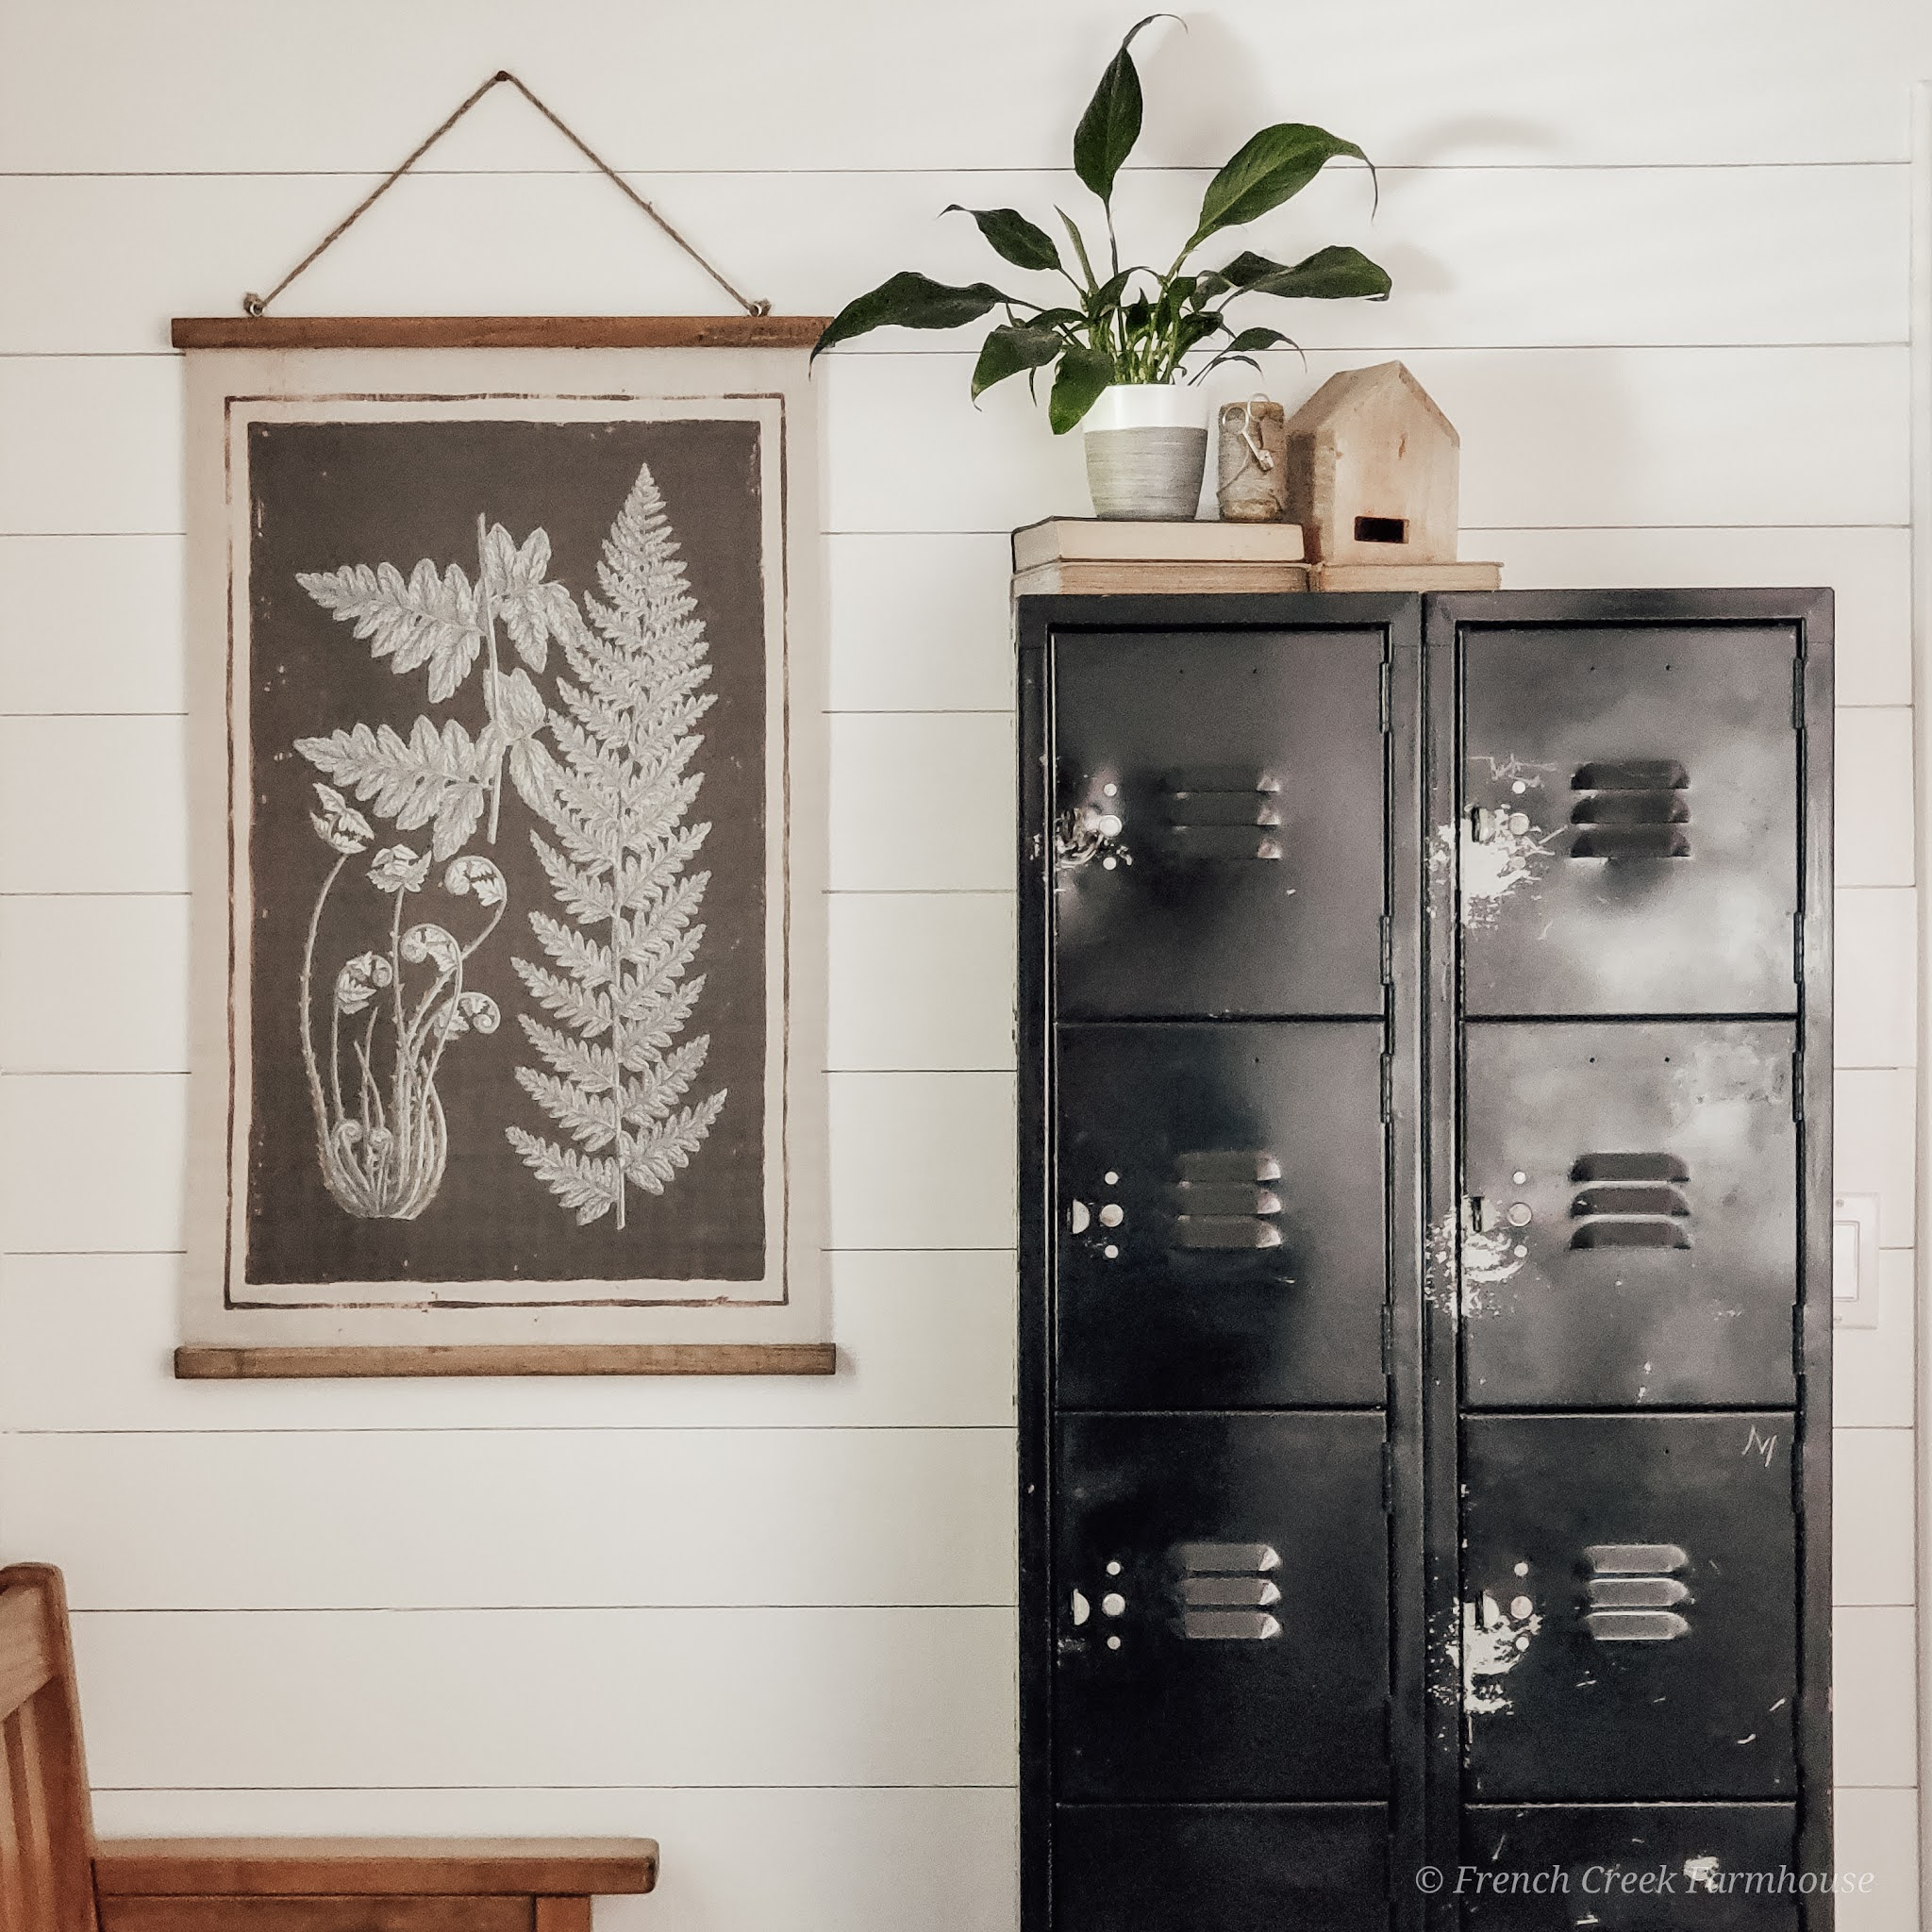 Repurposing vintage lockers provides extra storage in our mudroom